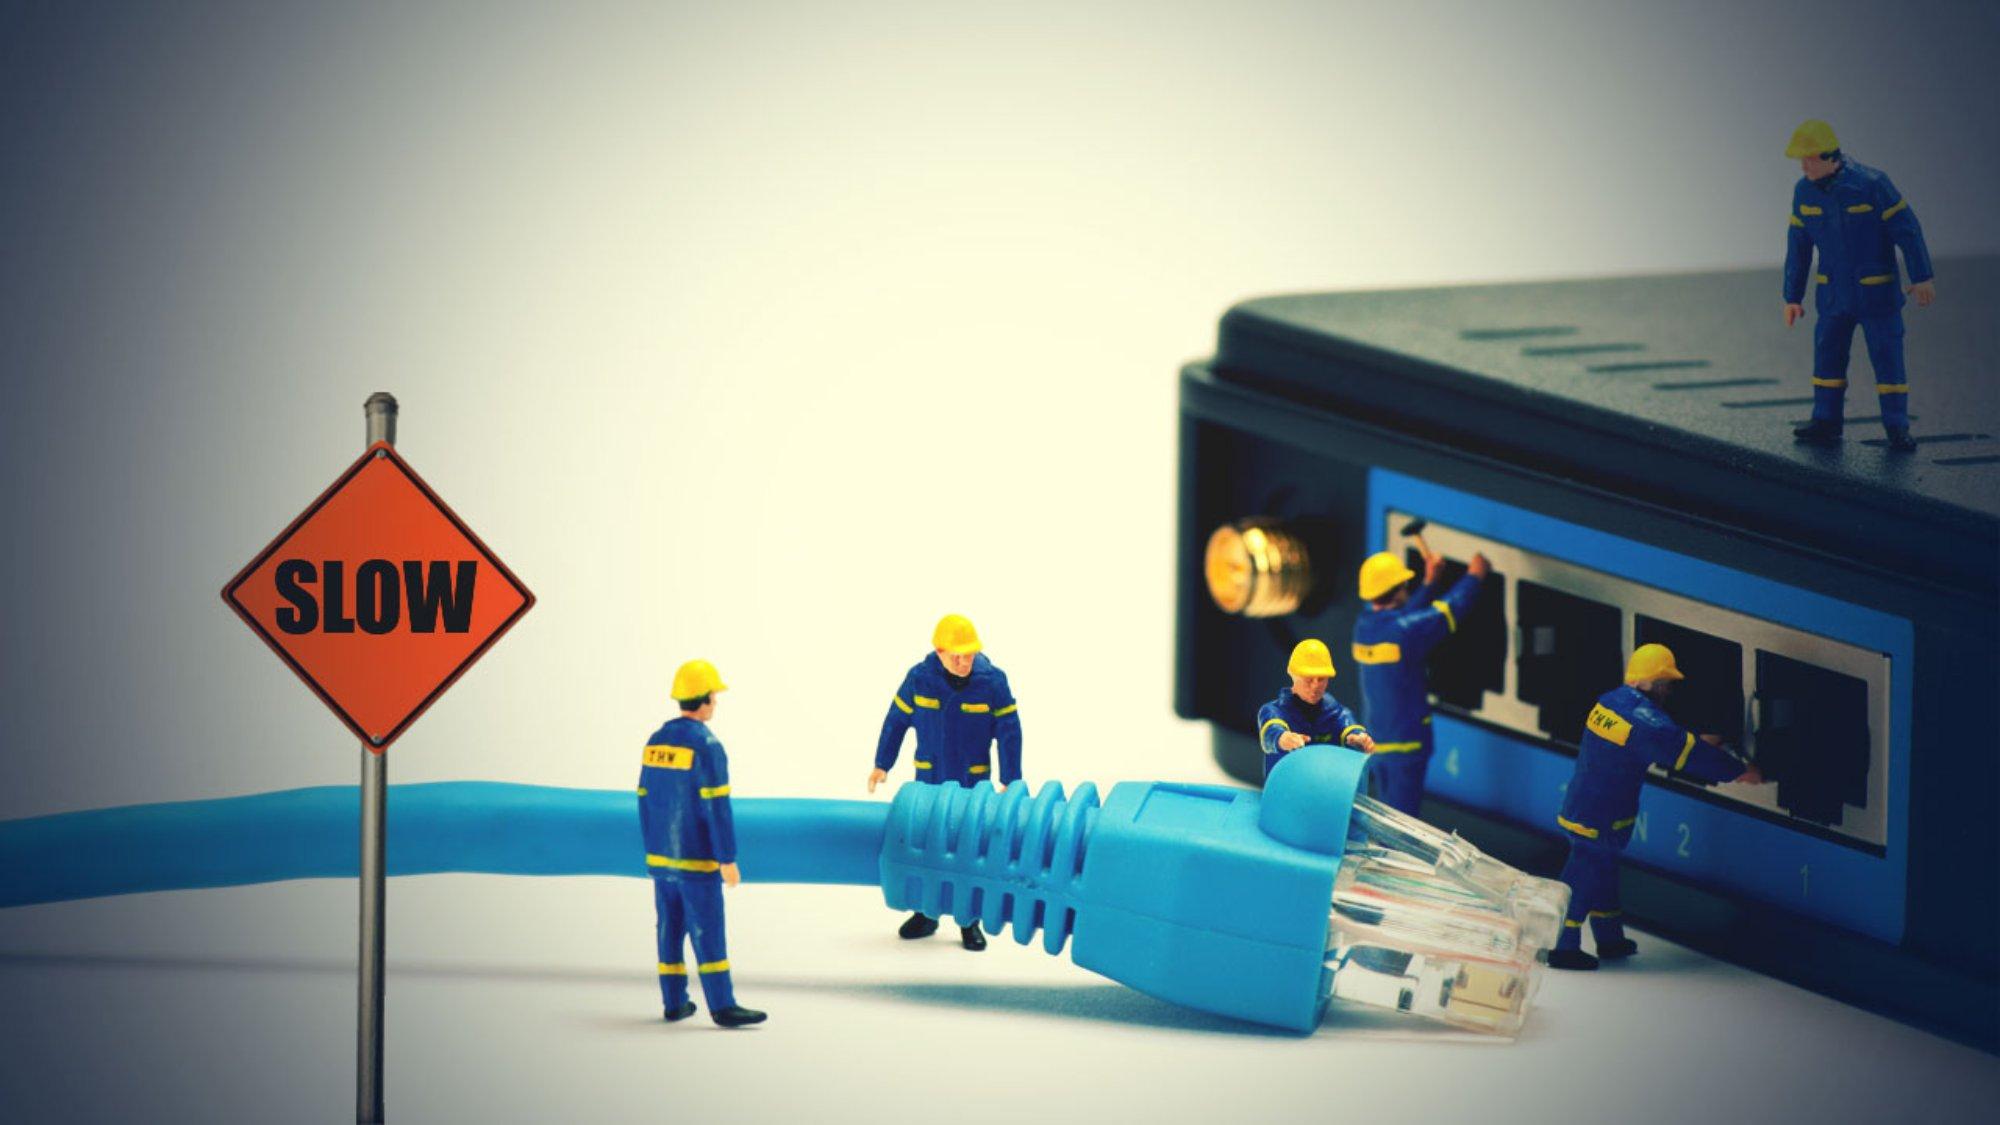 iran internet service providers low customer satisfaction index